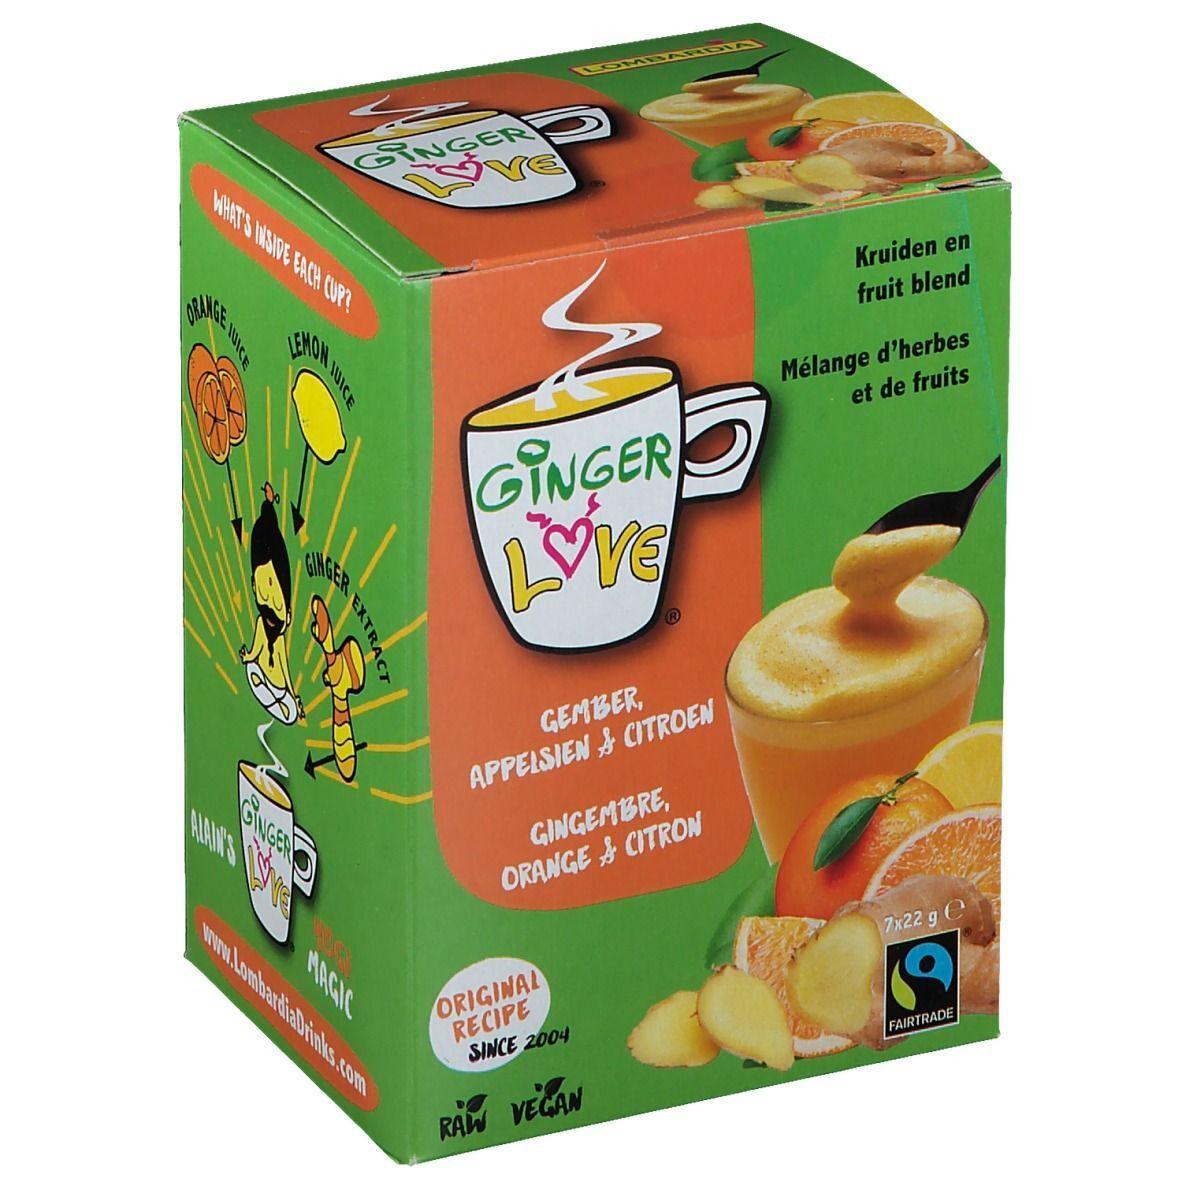 GingerLove Bio Thé Gingembre, Orange & Citron pc(s) sachet(s) filtre(s)